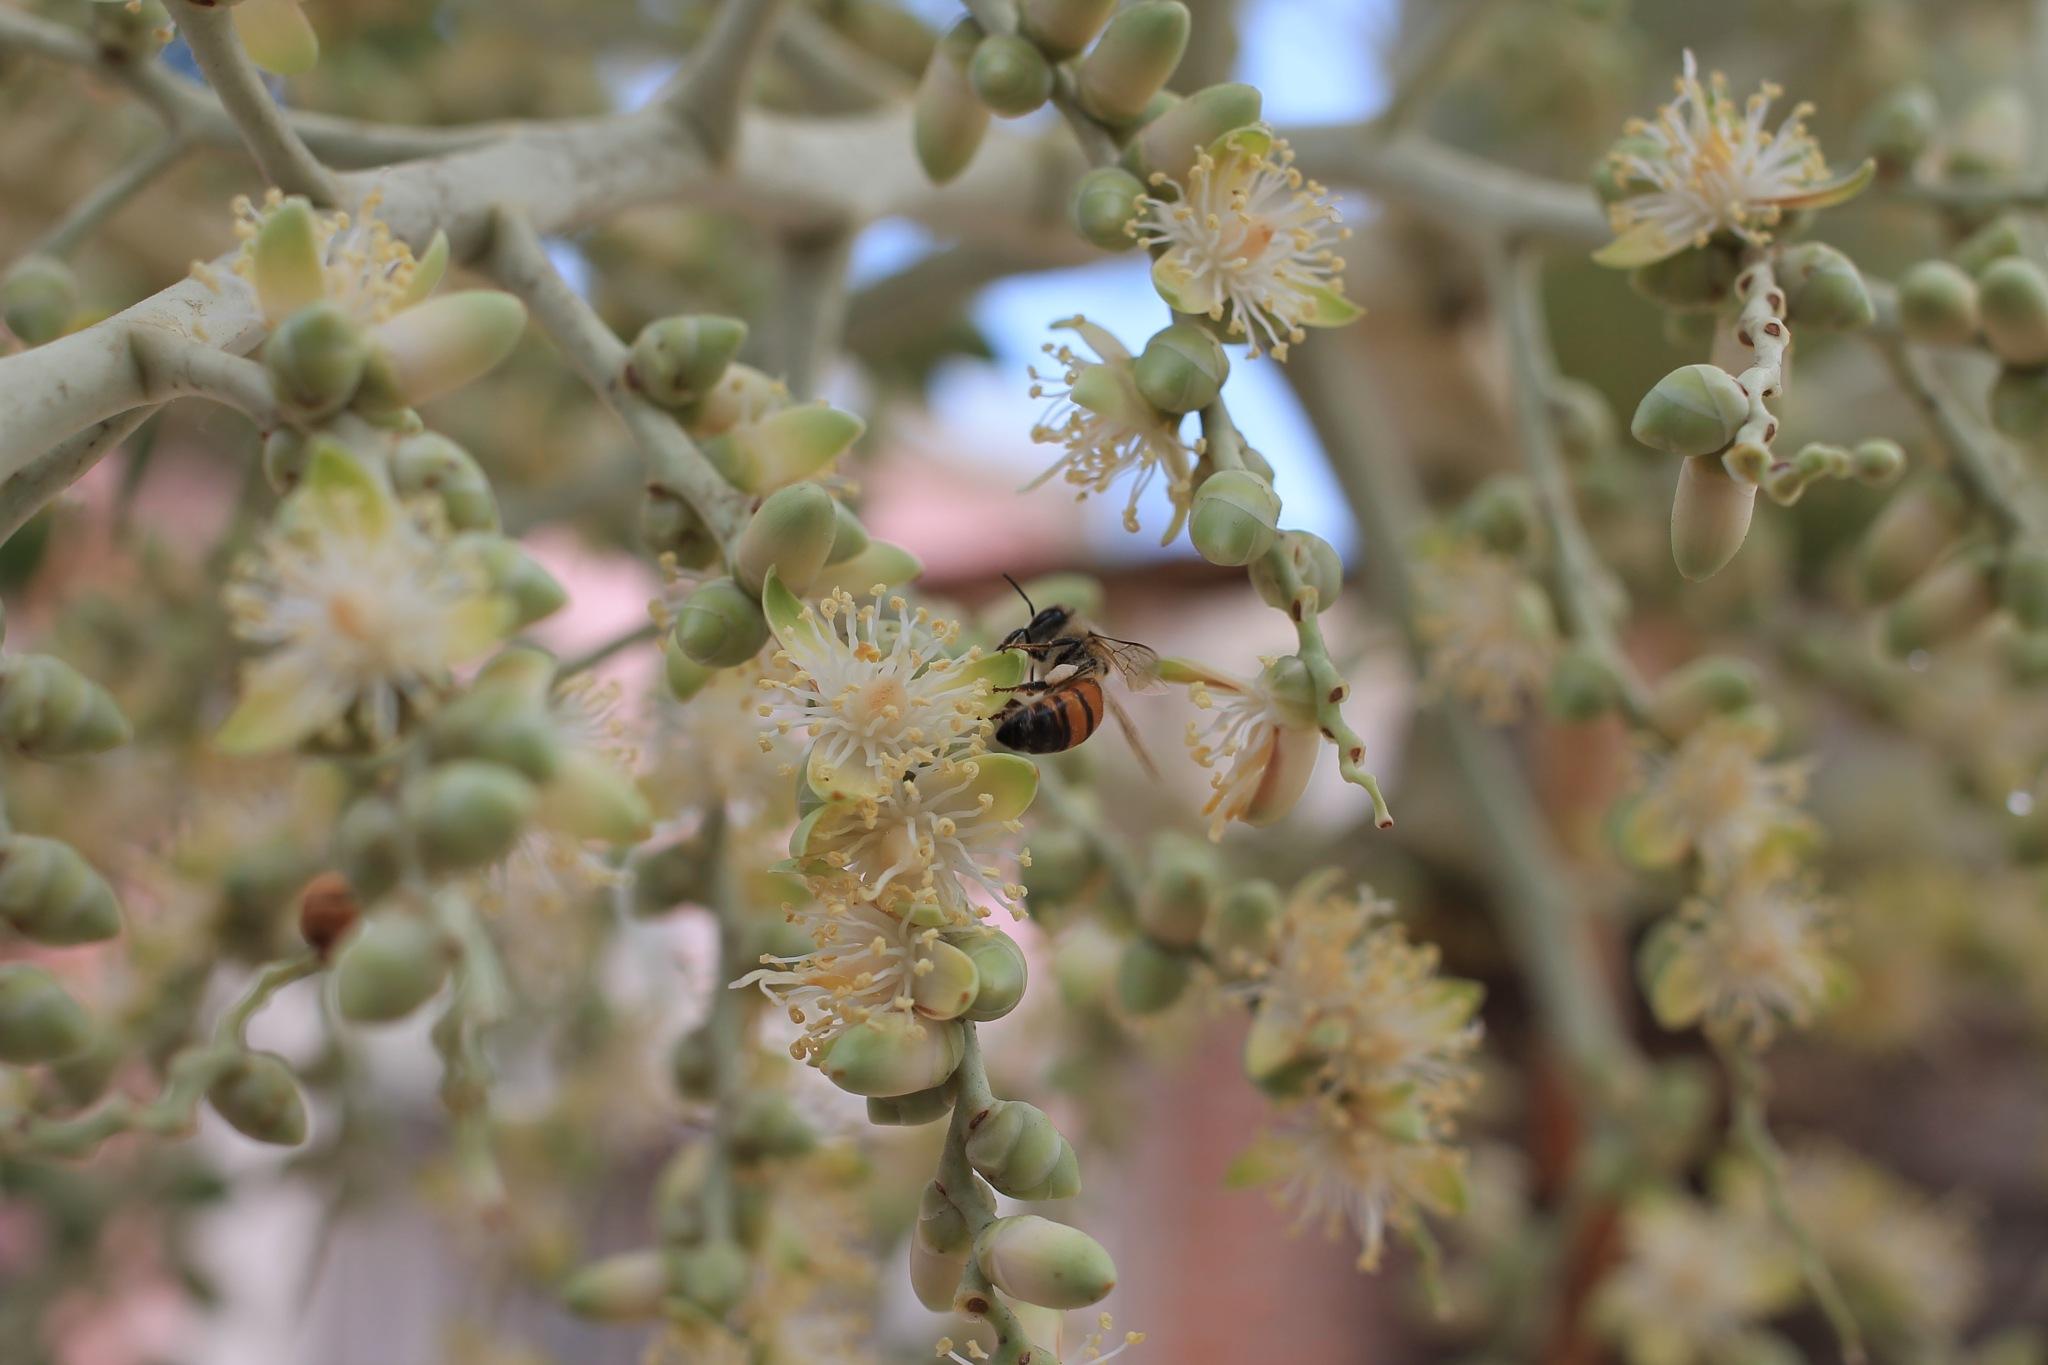 Bee careful by Paul Alvarez